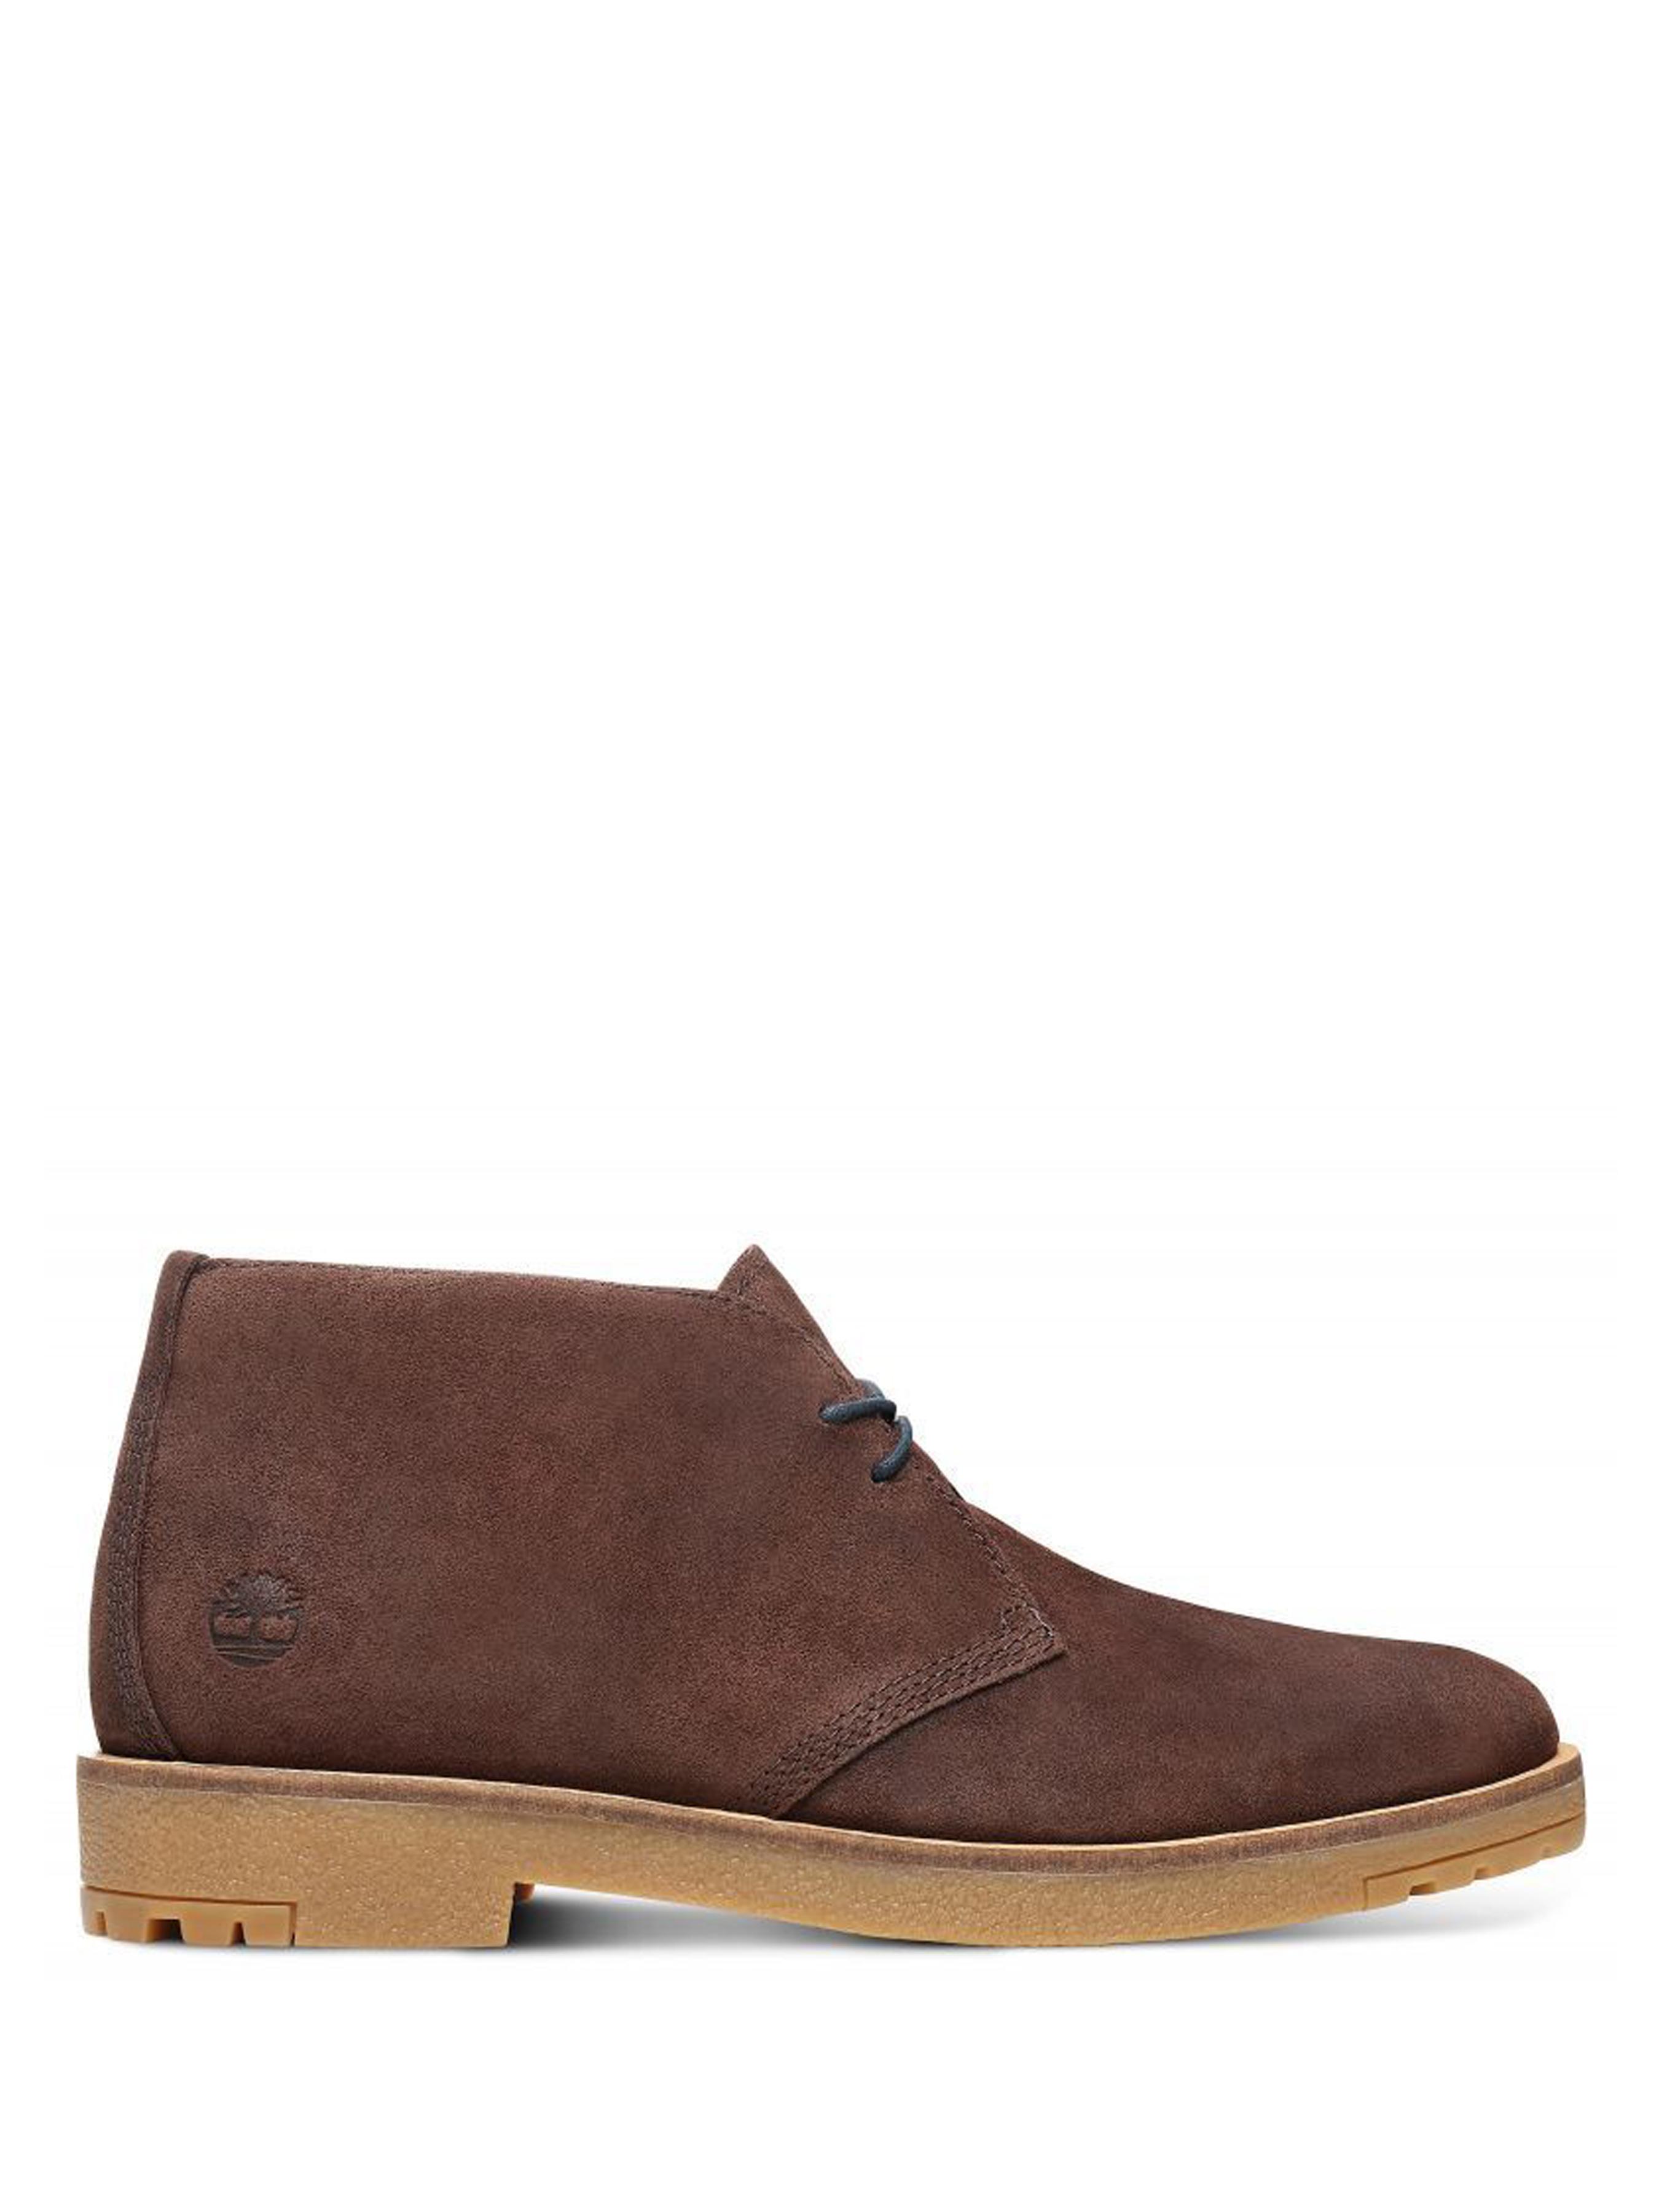 Ботинки для мужчин Timberland Folk Gentleman TF3855 купить, 2017